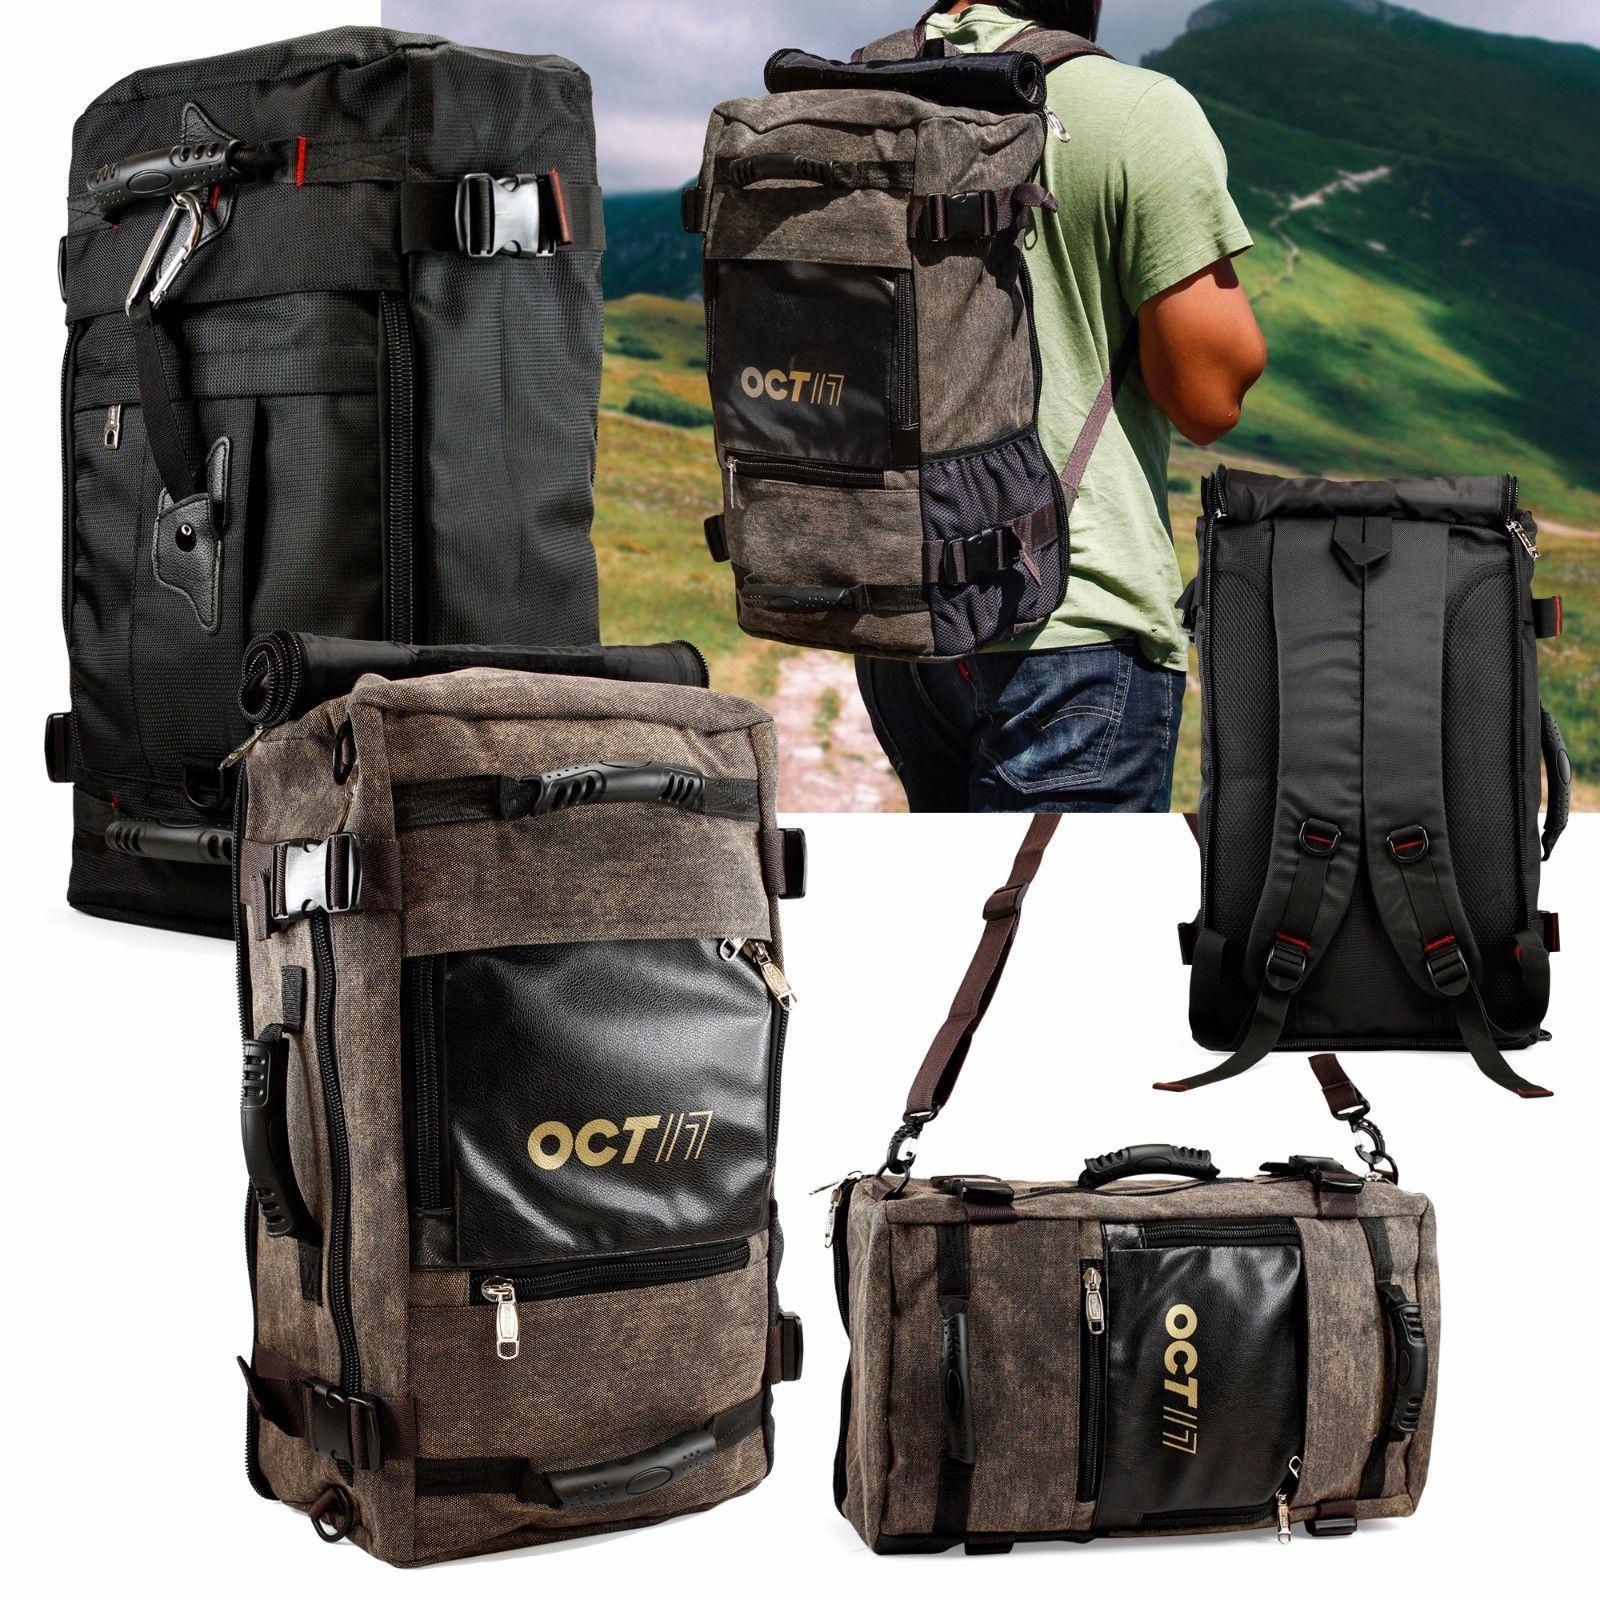 Men's Vintage Canvas Backpack Travel Sport Rucksack Satchel School Hiking Bag https://t.co/wVKNEVFTtB https://t.co/ggj9KbiyQB